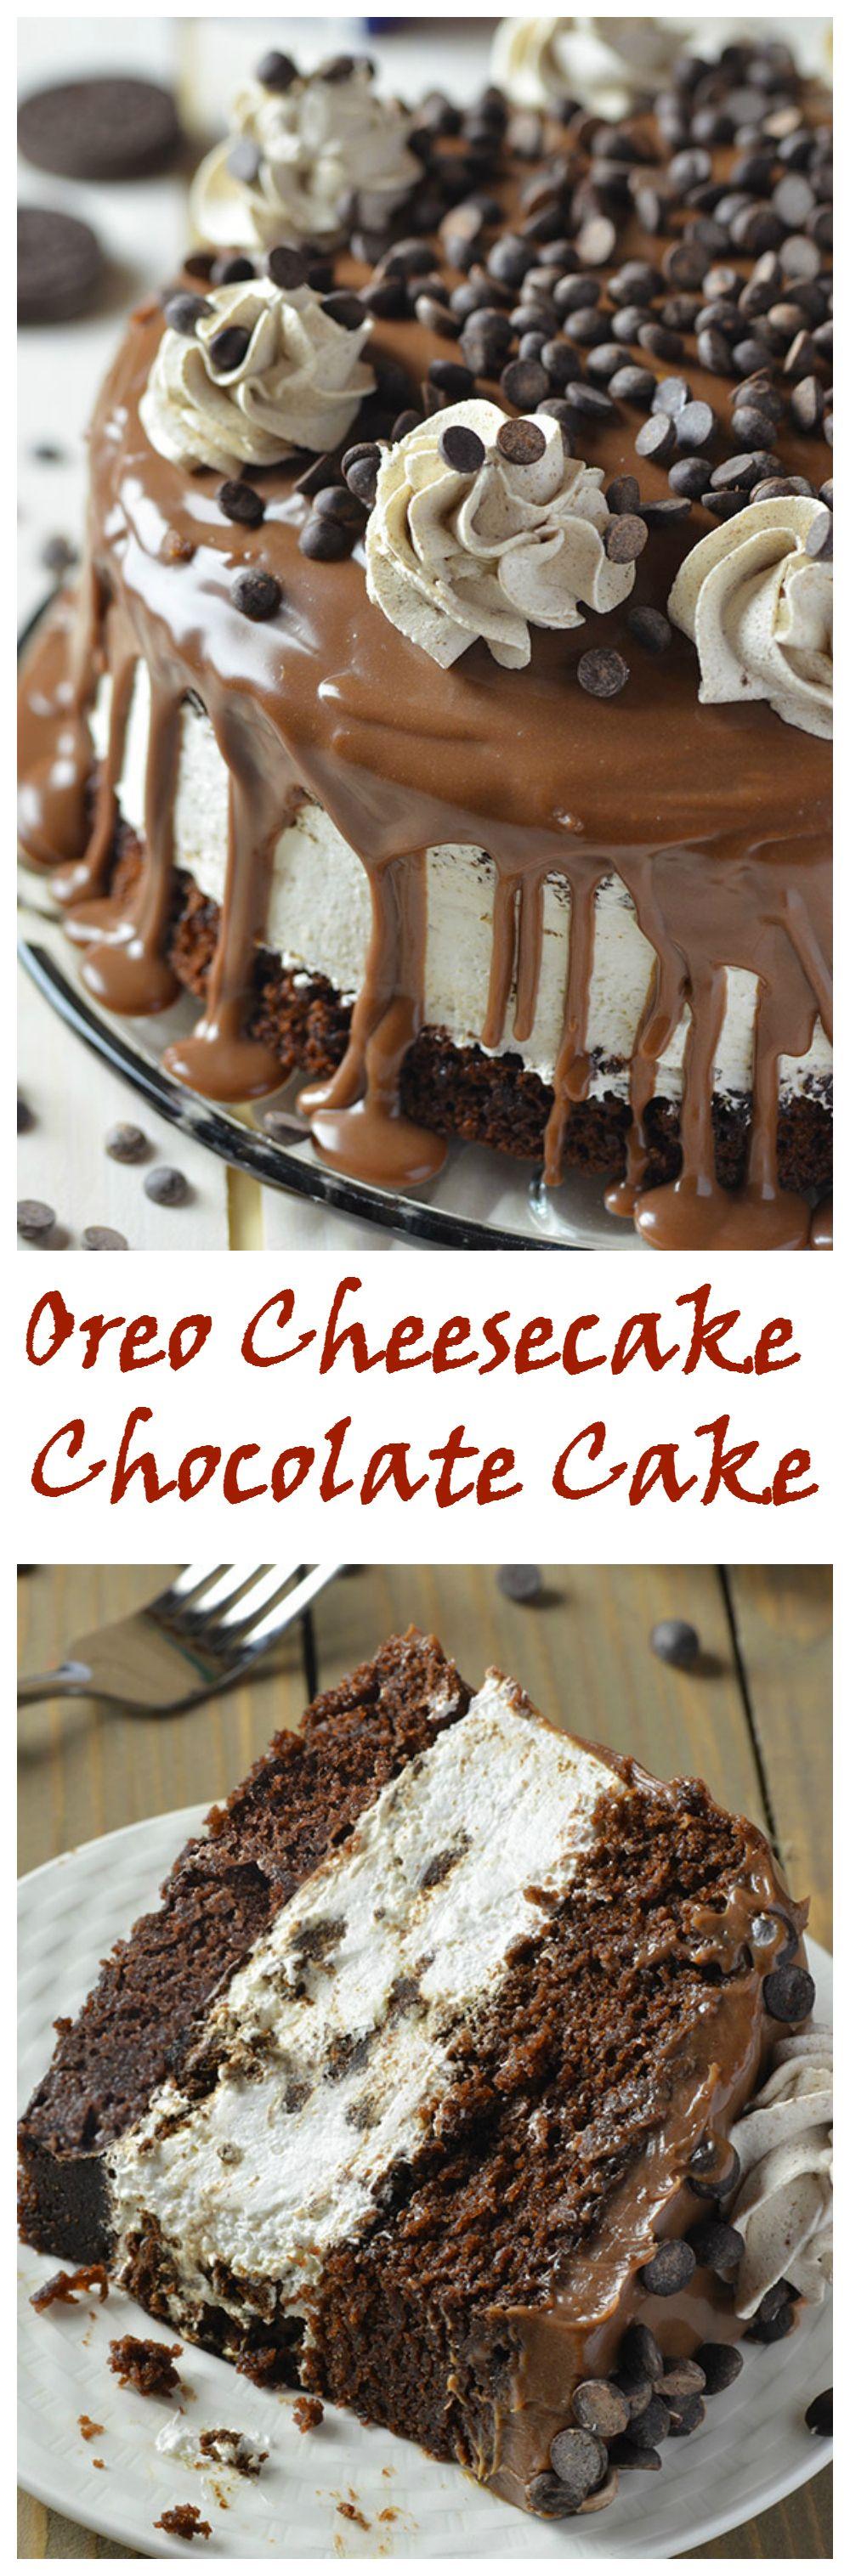 Oreo Cheesecake Chocolate Cake! via OMG Chocolate Desserts. OMG!